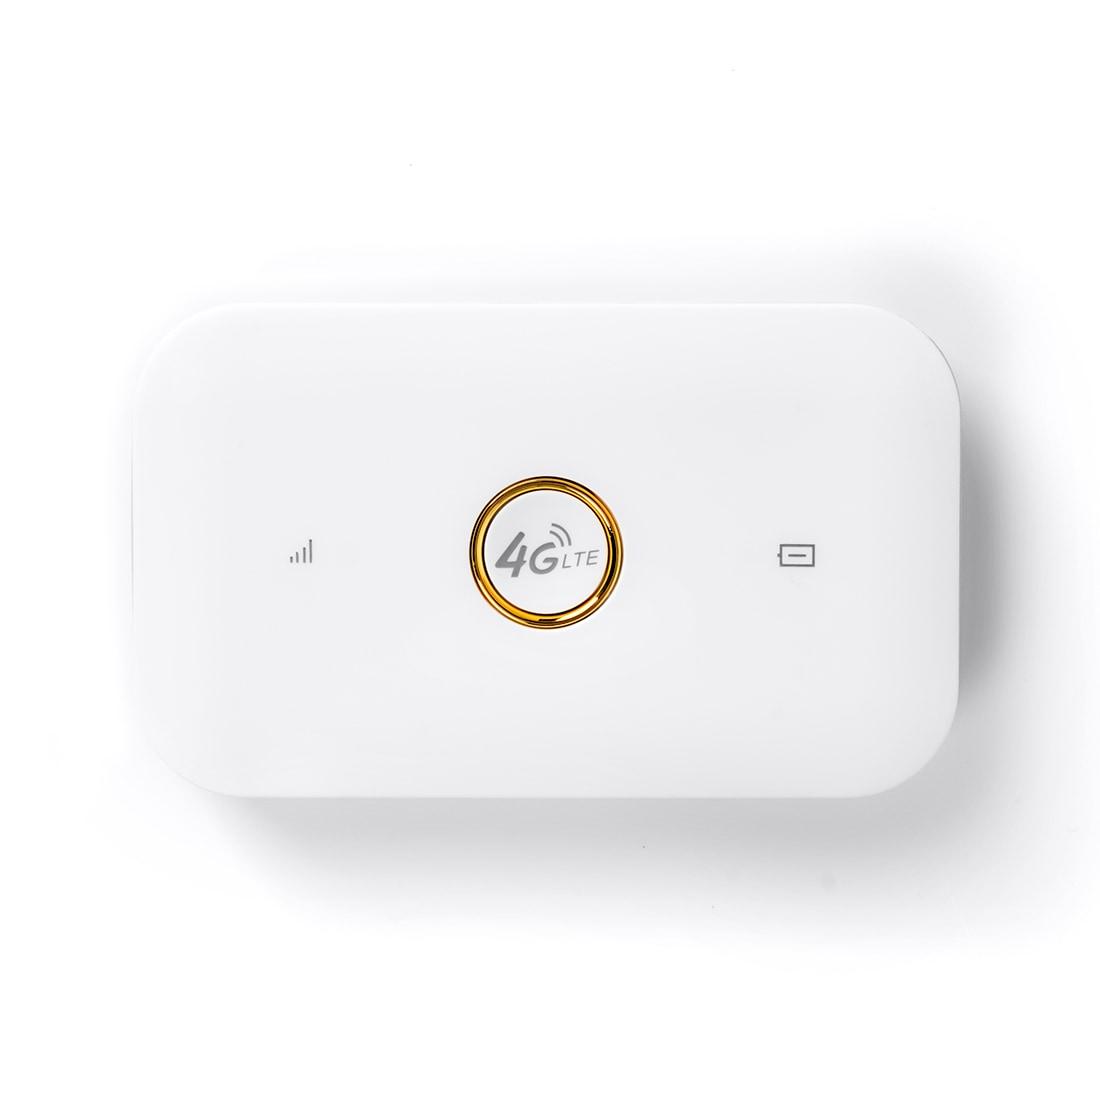 Router mobilny Alink M960 4G LTE 150Mbps SIM - 5